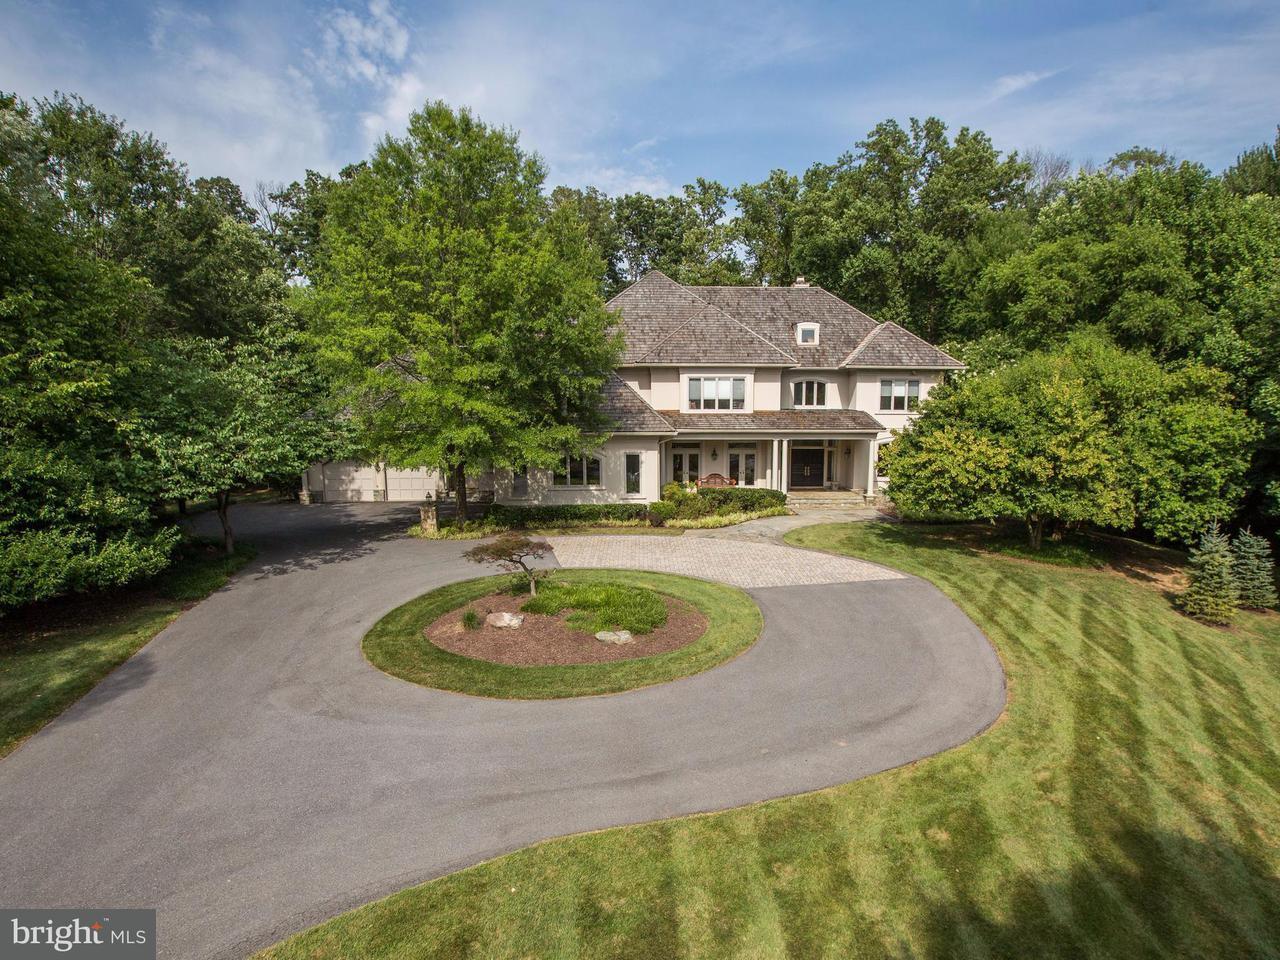 Single Family Home for Sale at 9719 AVENEL FARM Drive 9719 AVENEL FARM Drive Potomac, Maryland 20854 United States